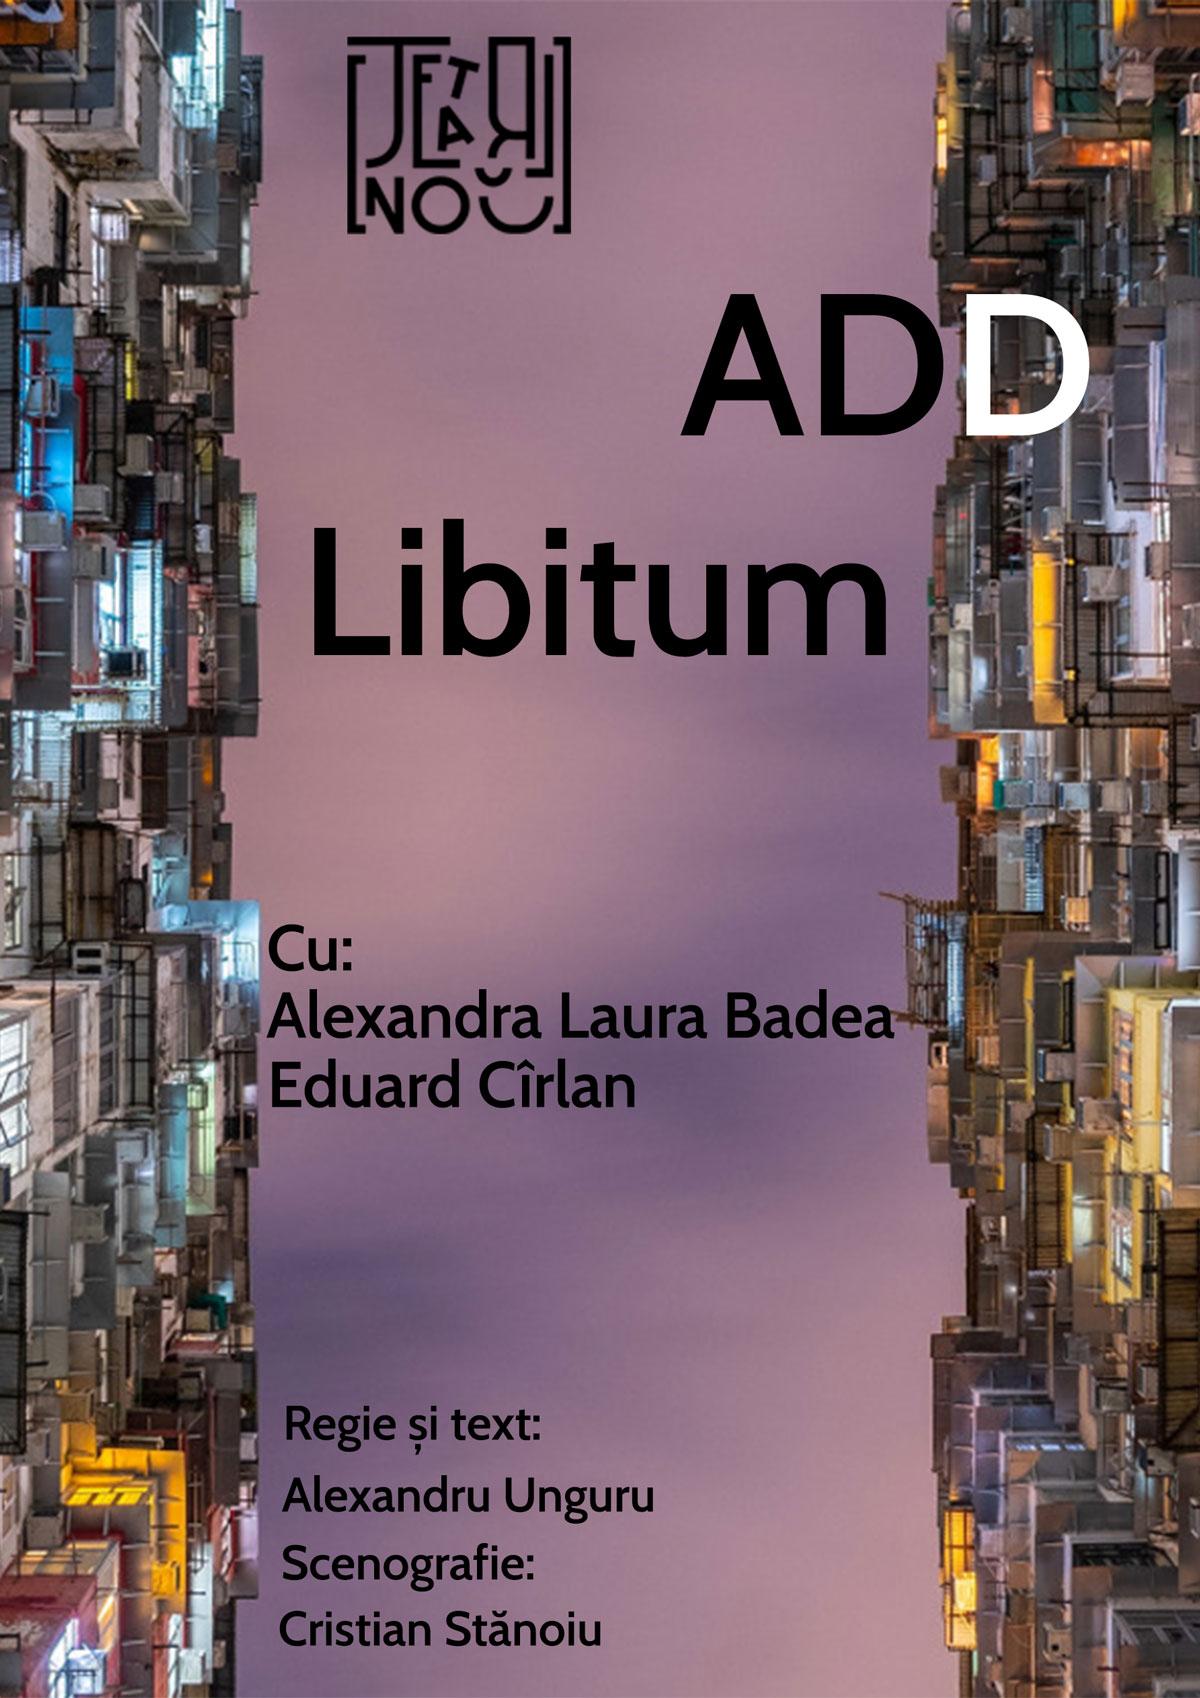 Add libitum - Teatrul Nou POSTER